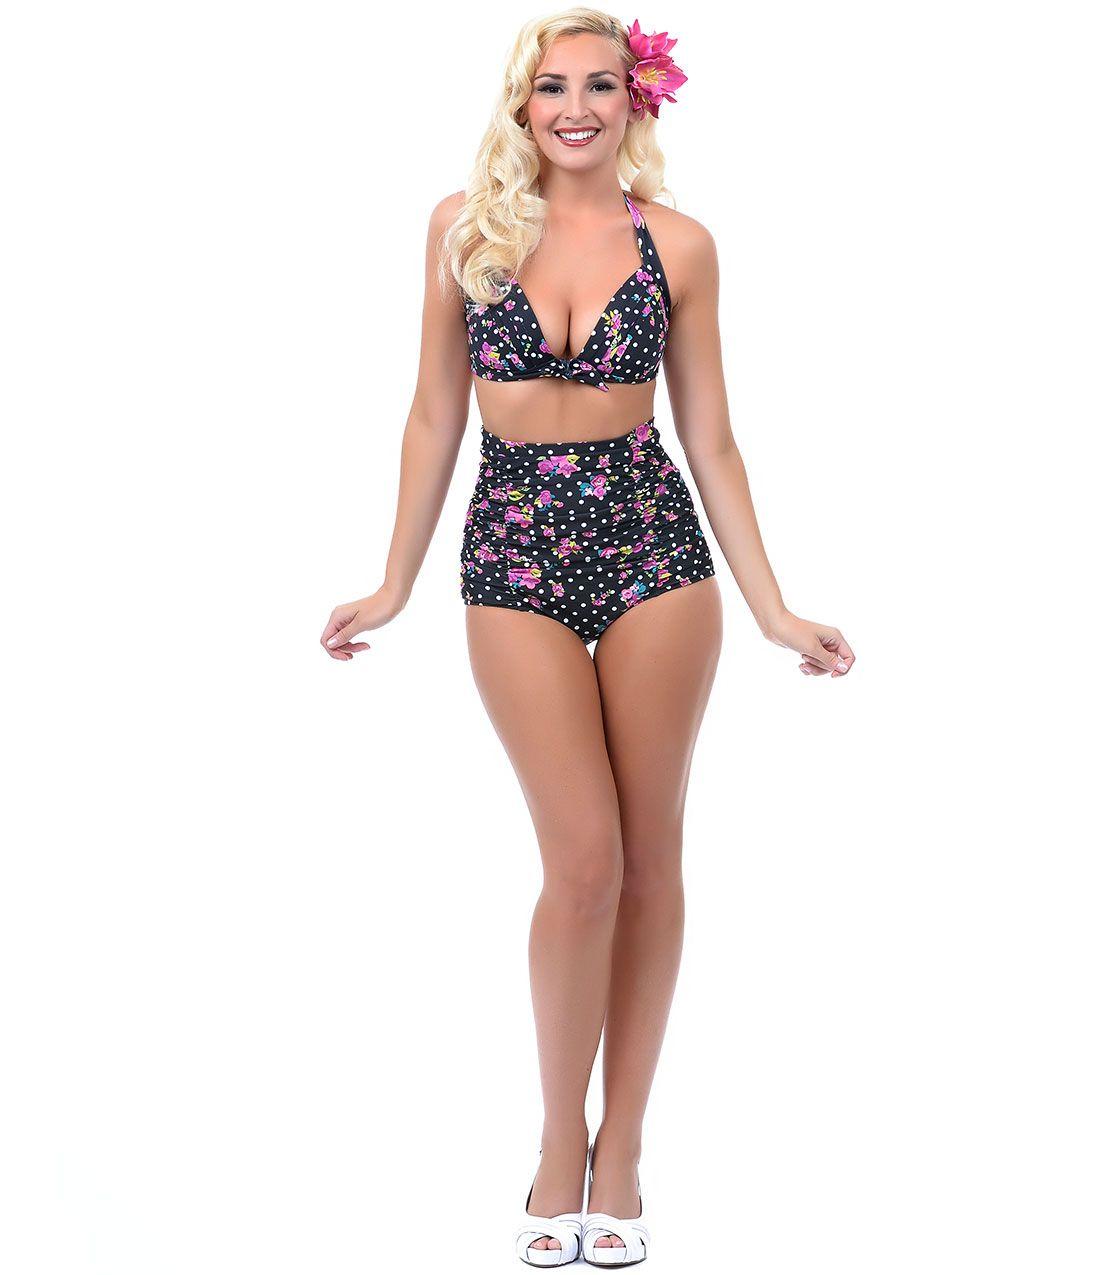 dress style bathing suits bikinis